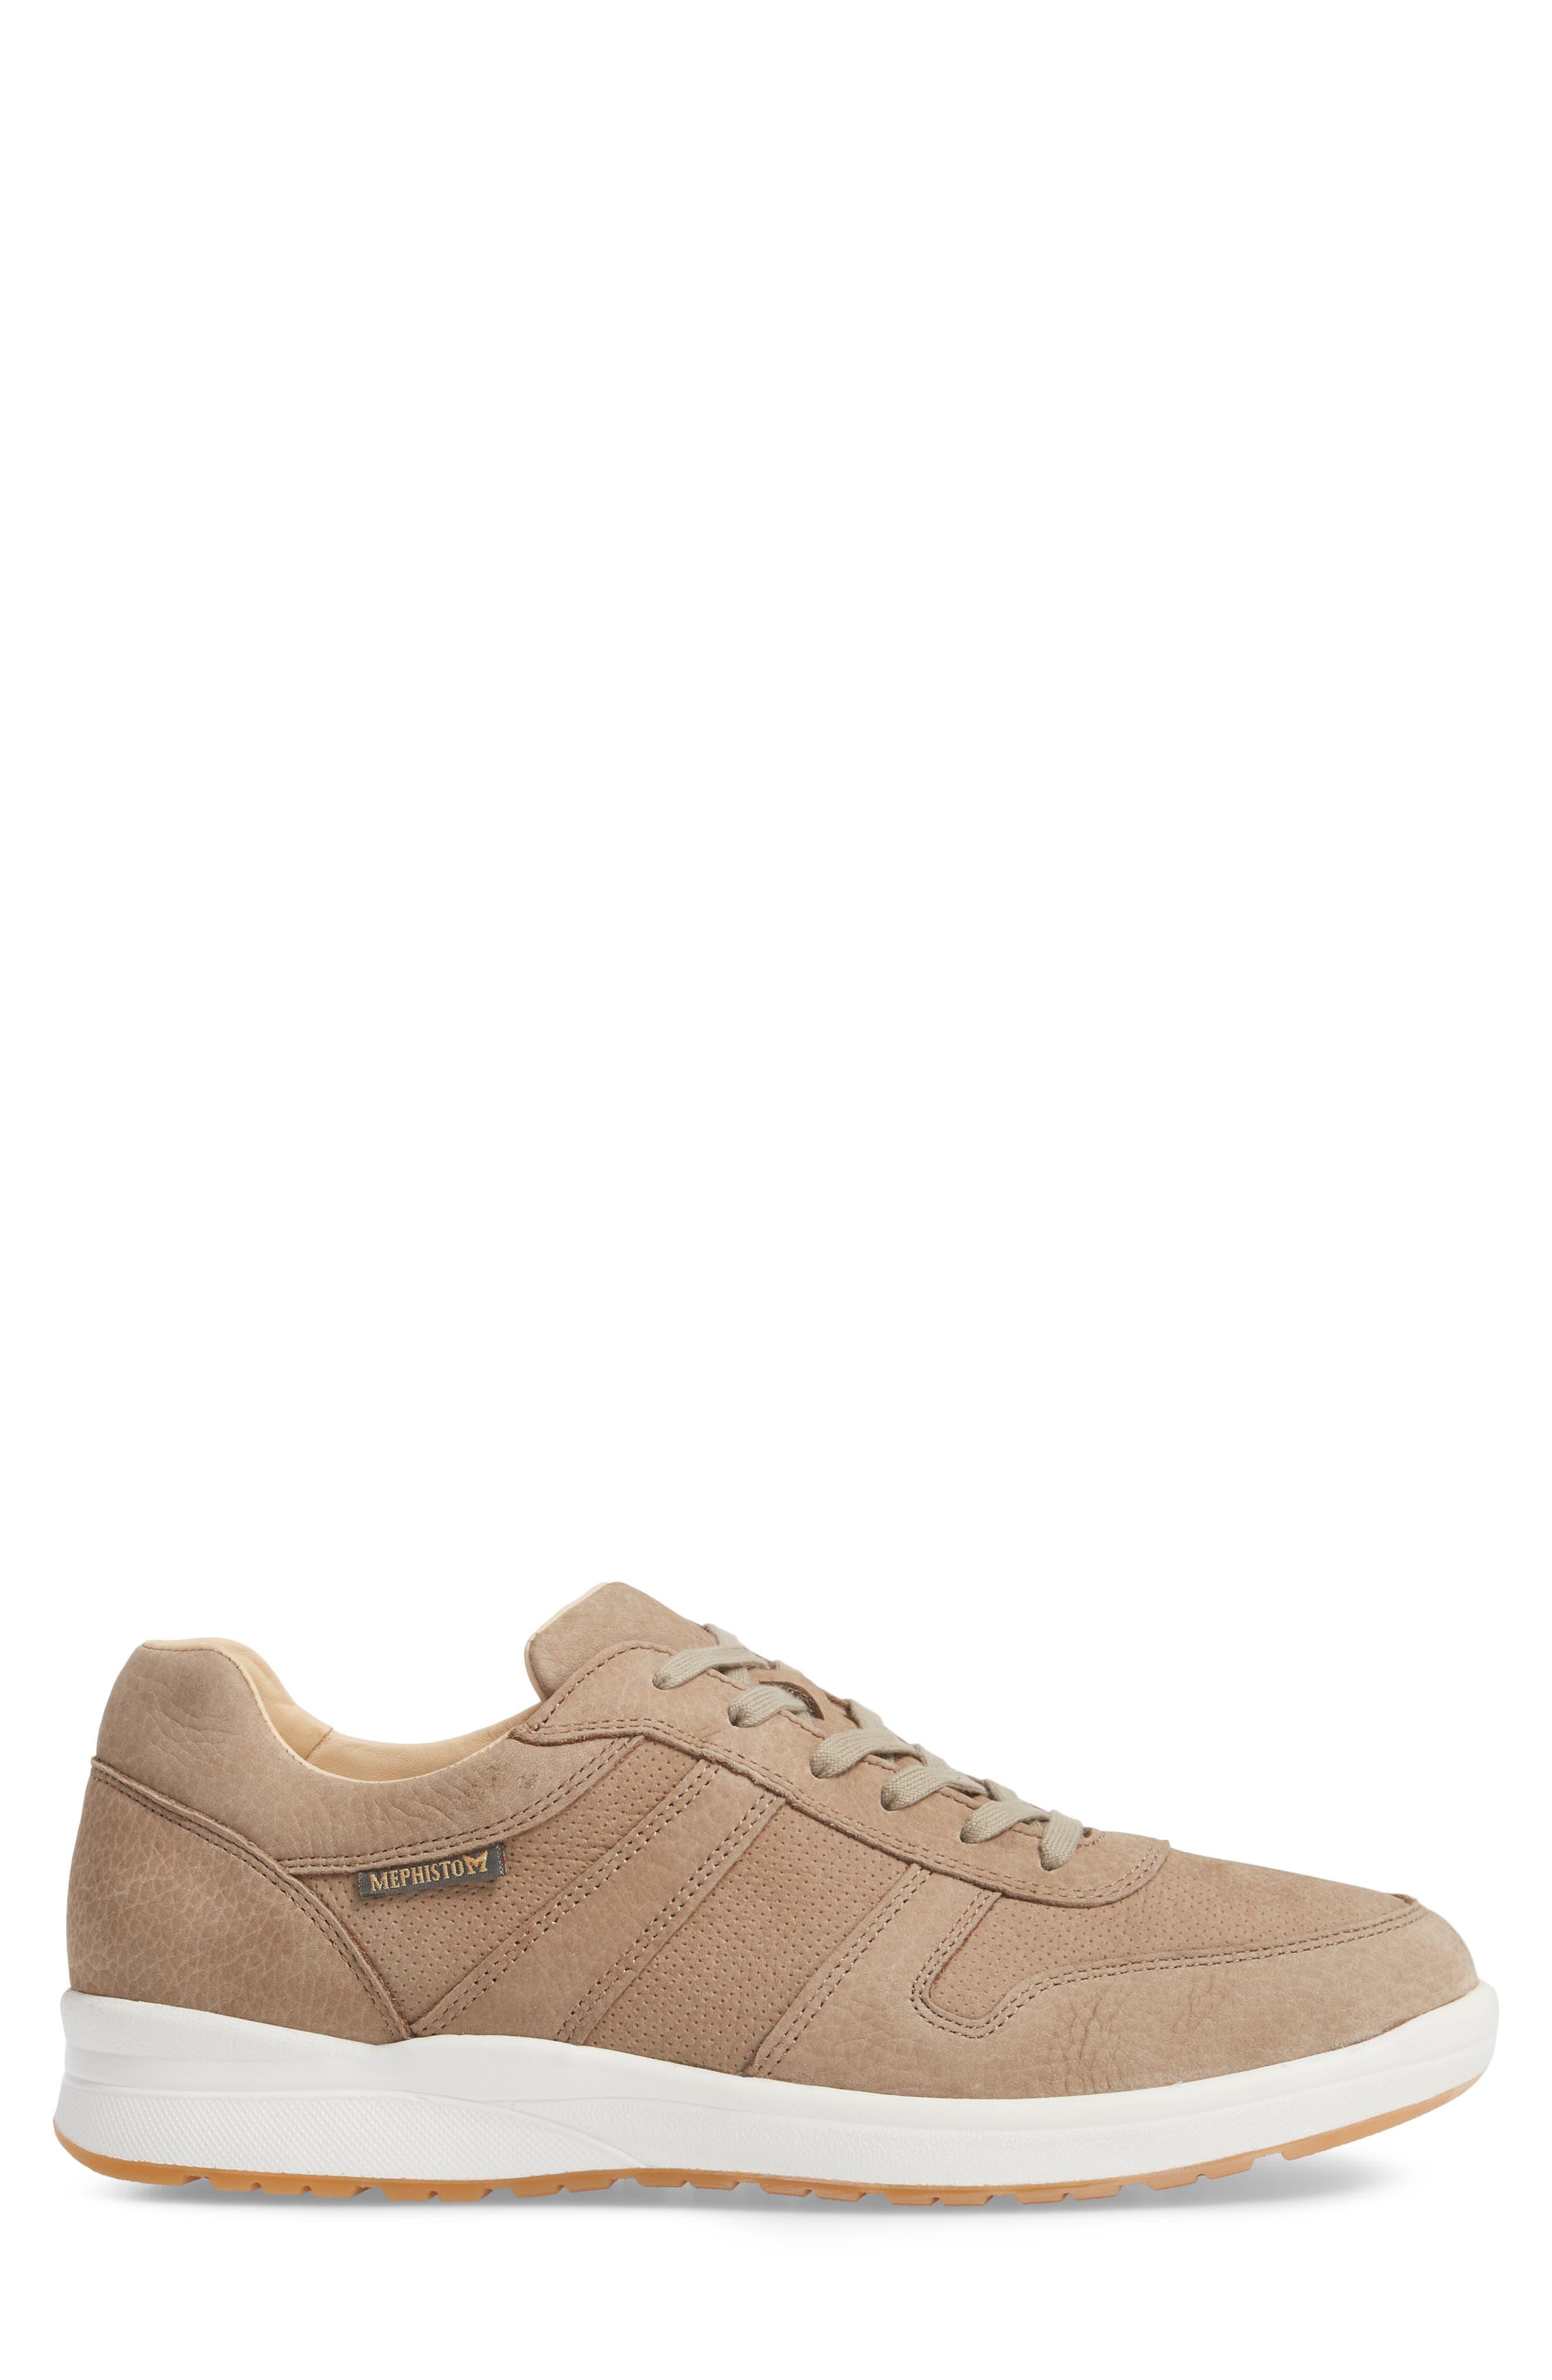 Vito Perforated Sneaker,                             Alternate thumbnail 3, color,                             281